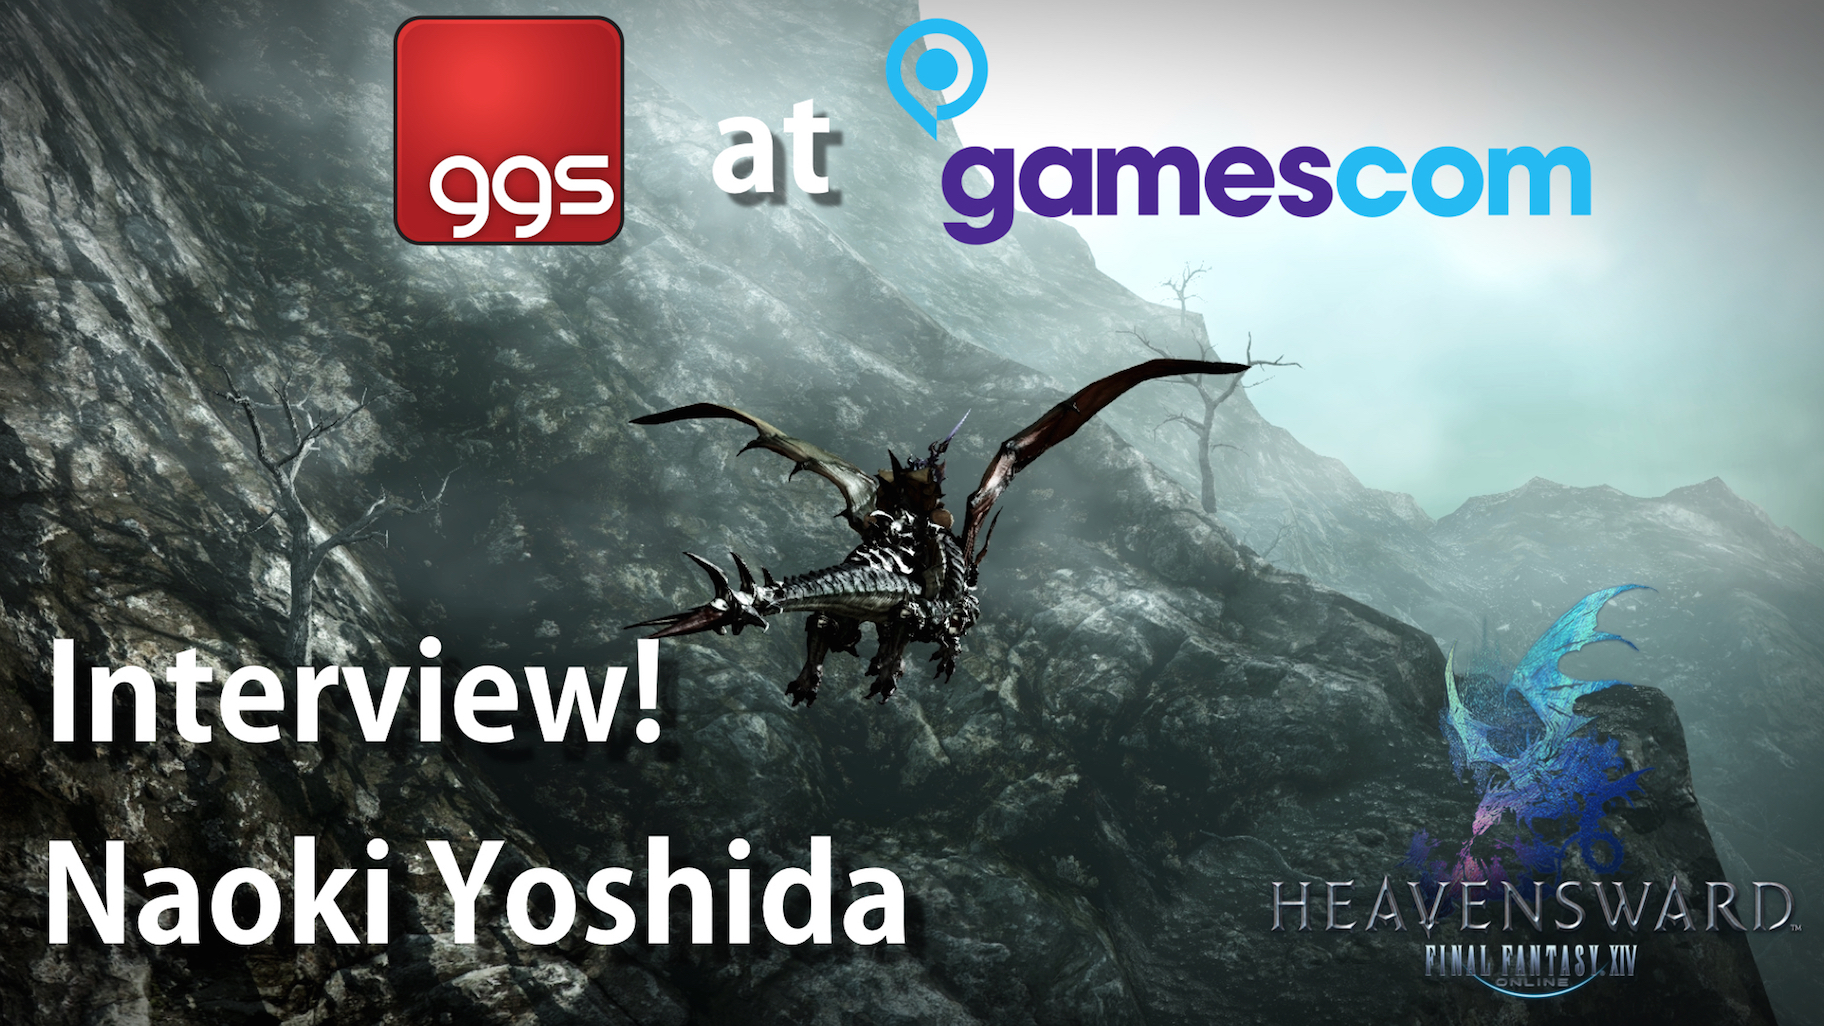 gamescom 2015 – Interview with FFXIV Director Naoki Yoshida